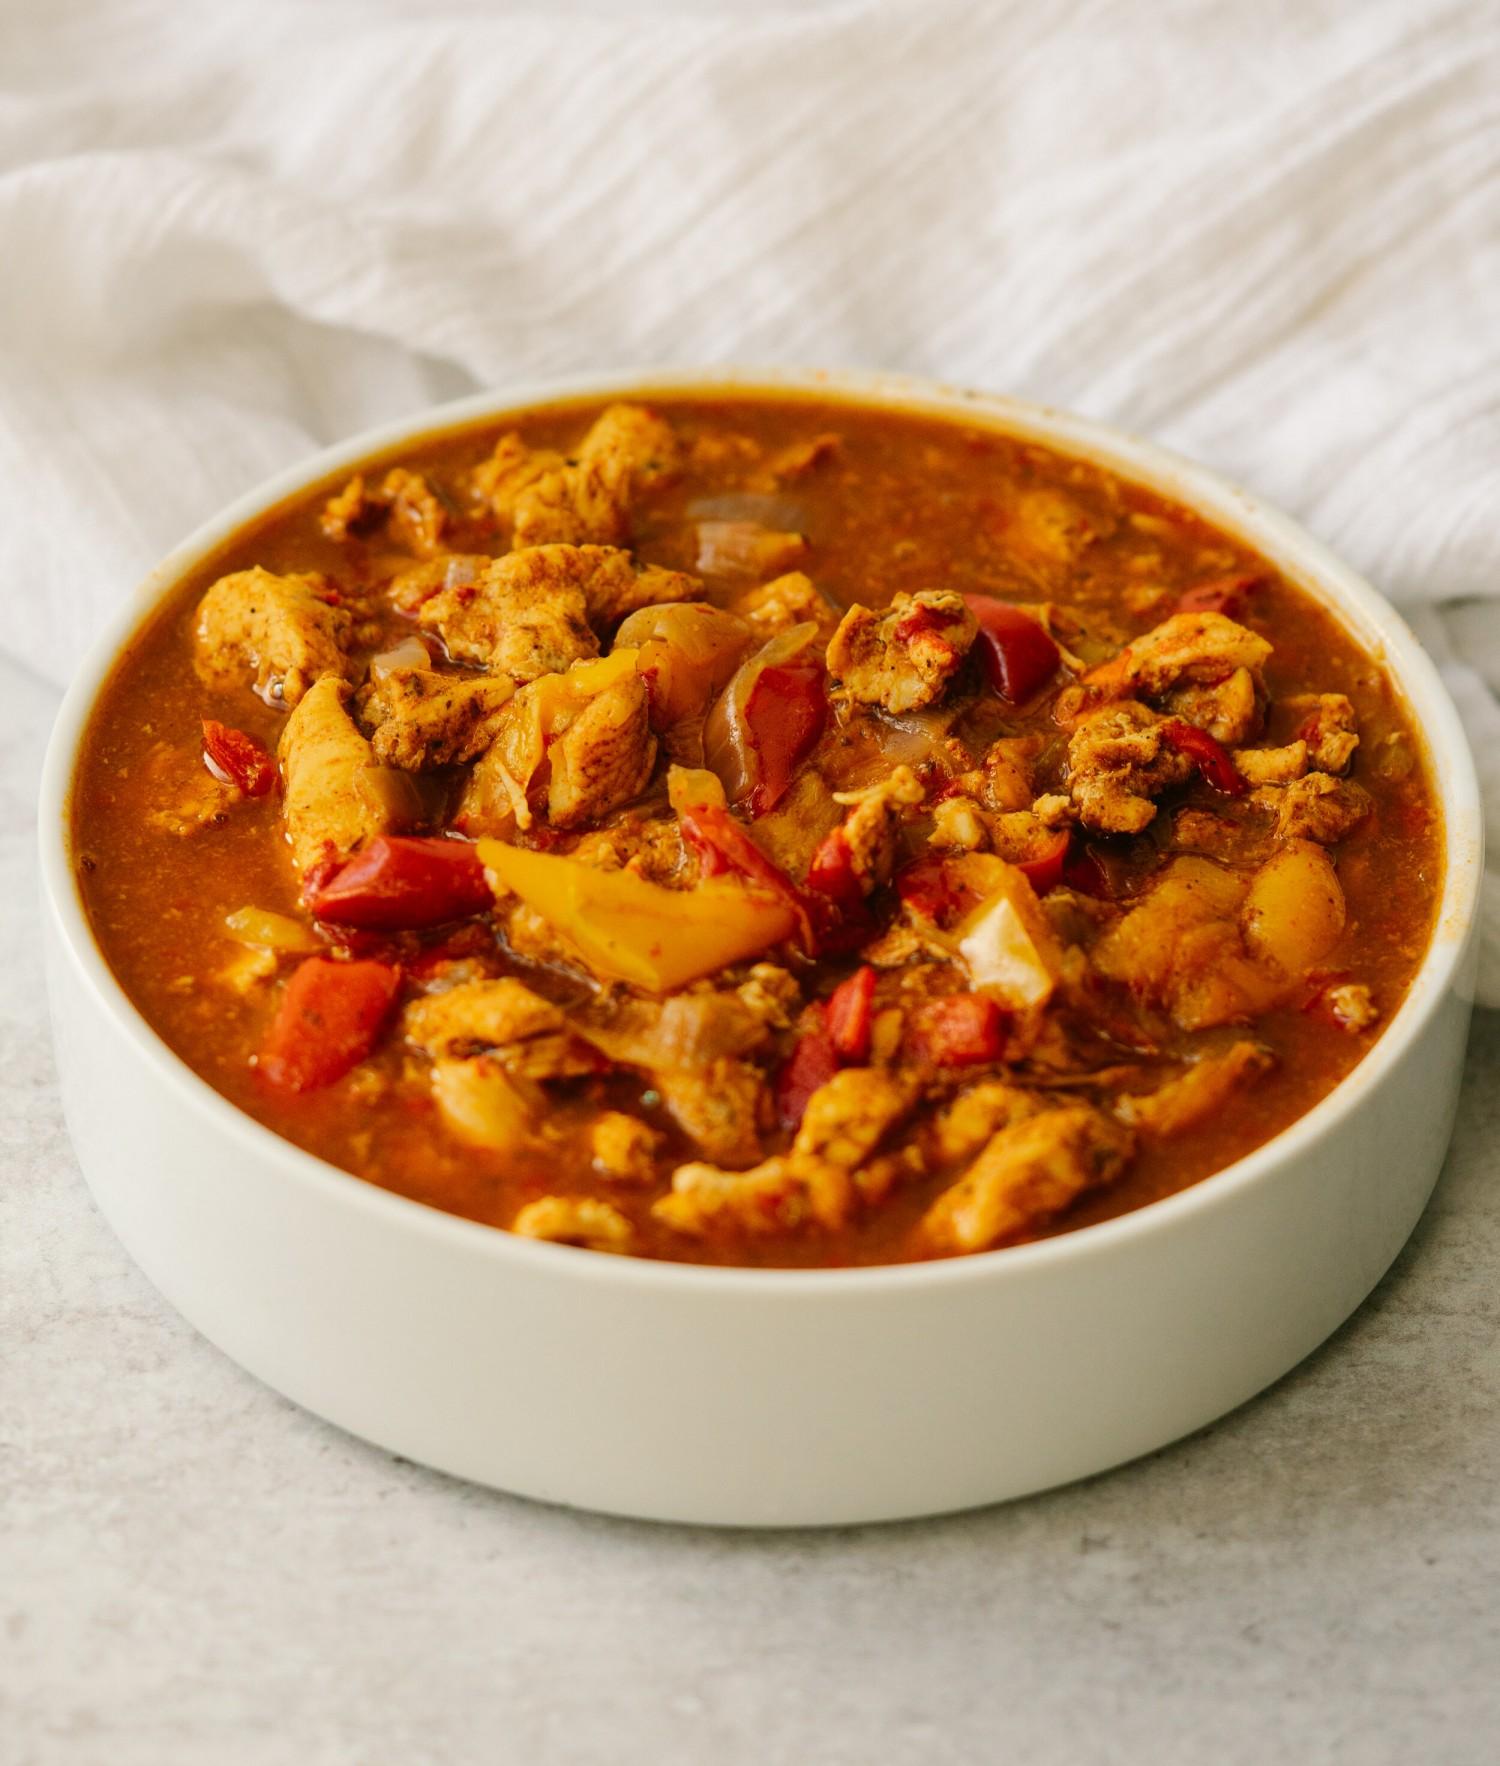 Three quarter view of Instant Pot Chicken Fajitas in a serving bowl